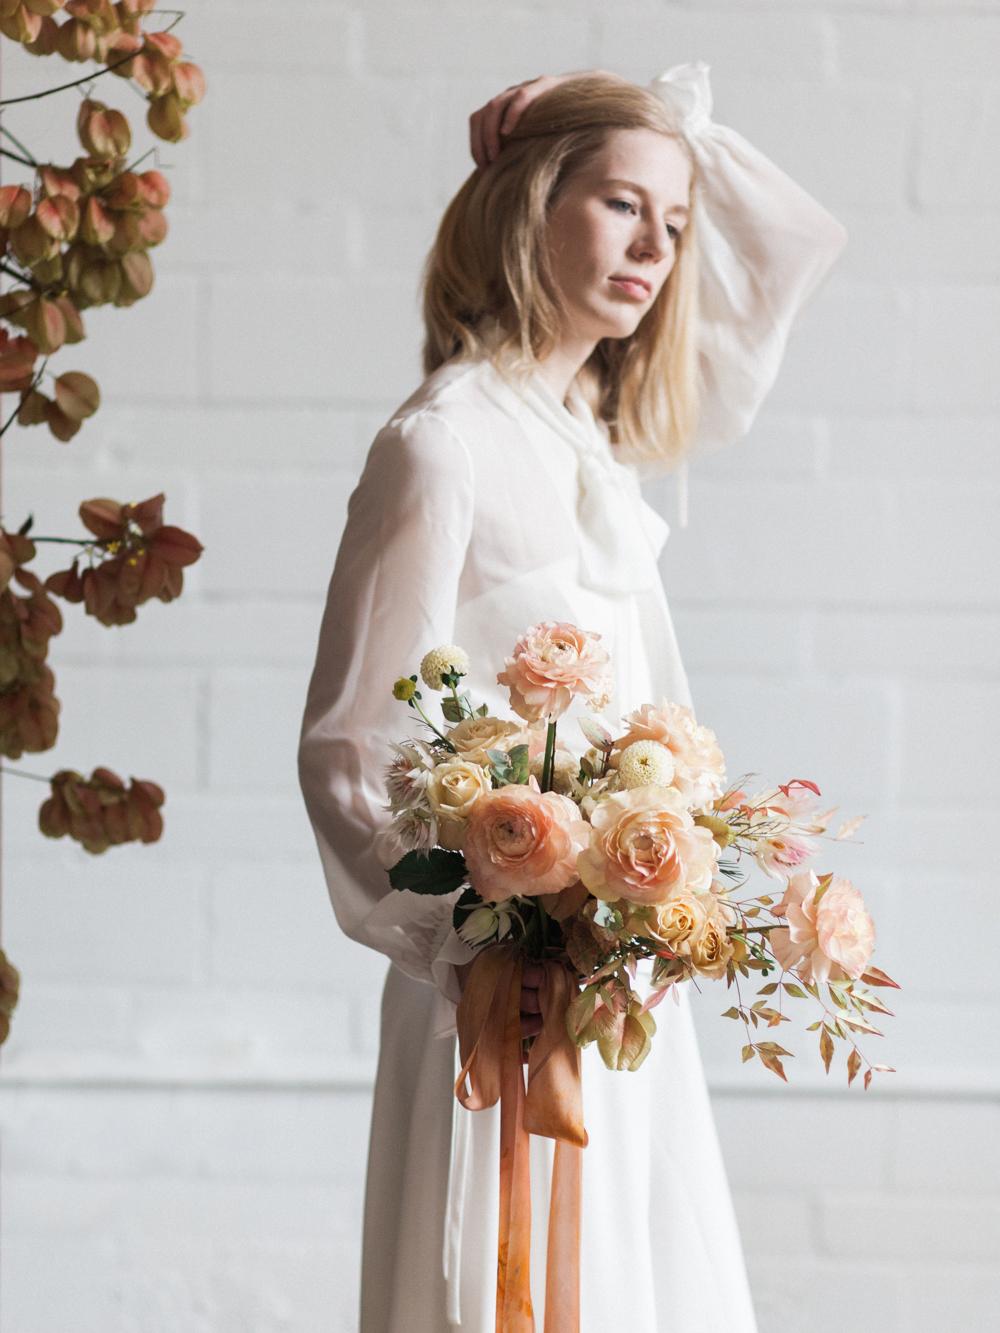 Christine Gosch - The Petaler - Houston fine art photographer - houston wedding florist-9.jpg